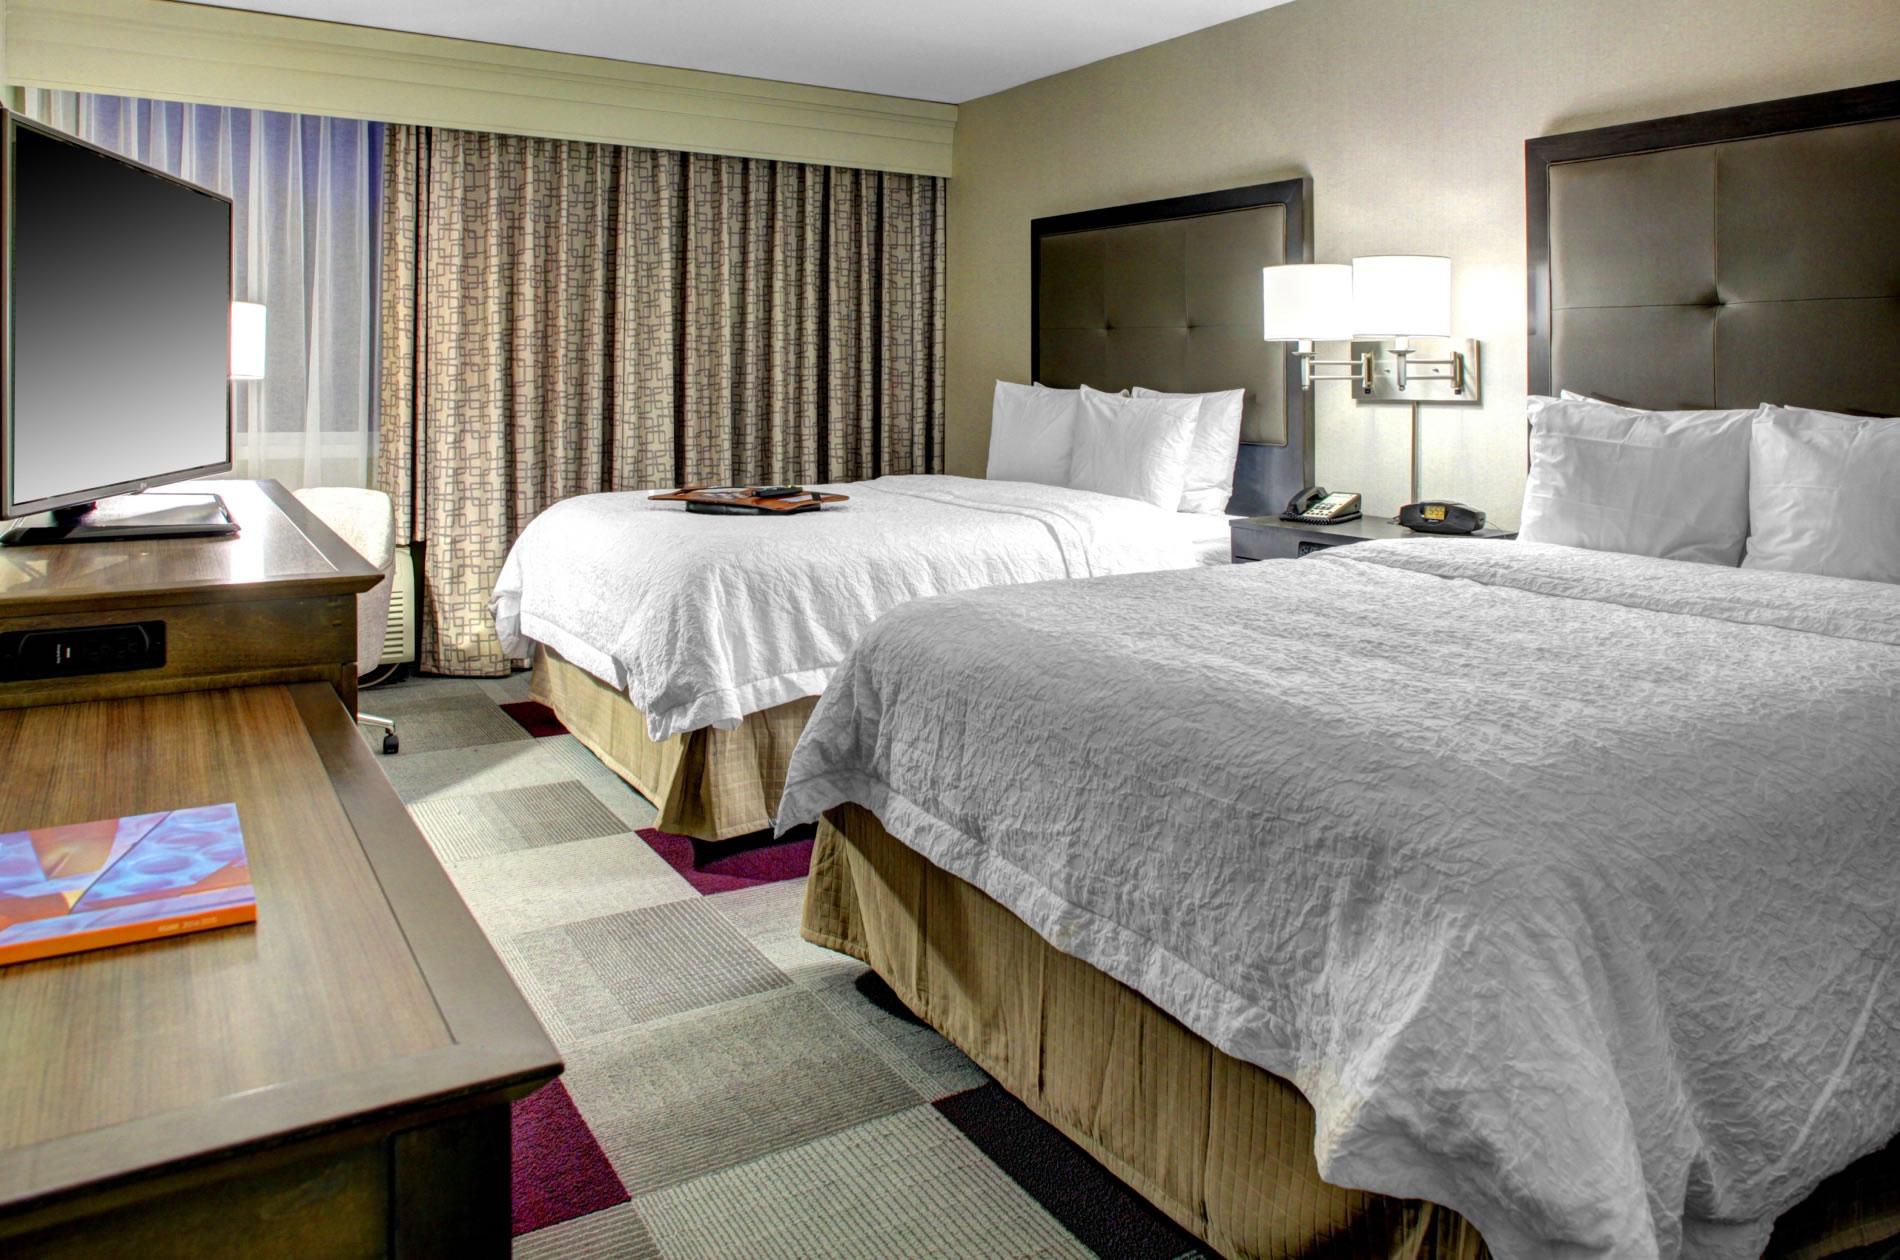 Hampton Inn by Hilton Coconut Grove Coral Gables Miami image 5